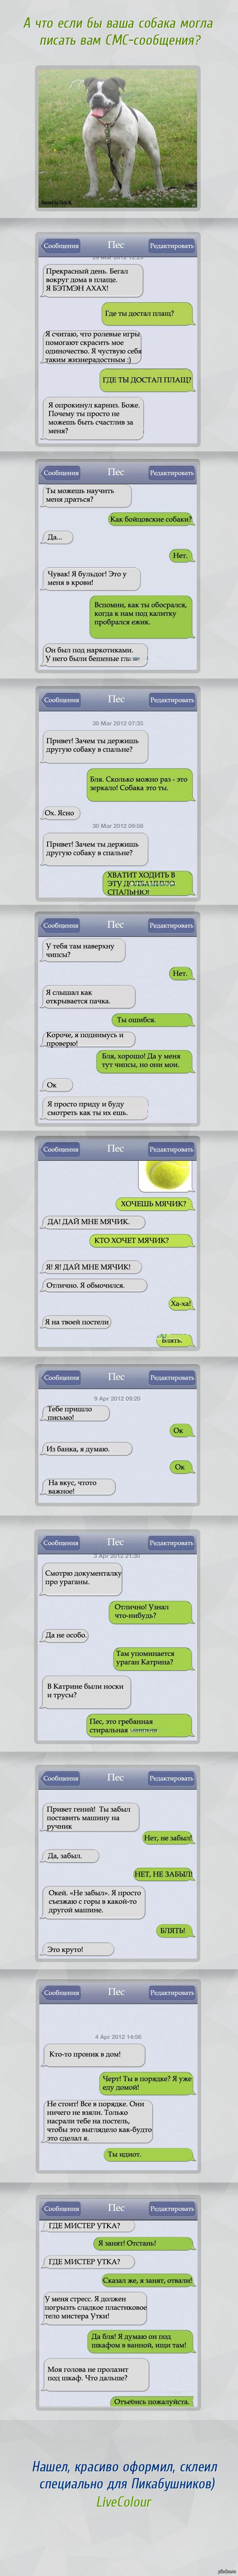 http://s.pikabu.ru/post_img/2013/07/04/7/1372931879_1859898033.jpg